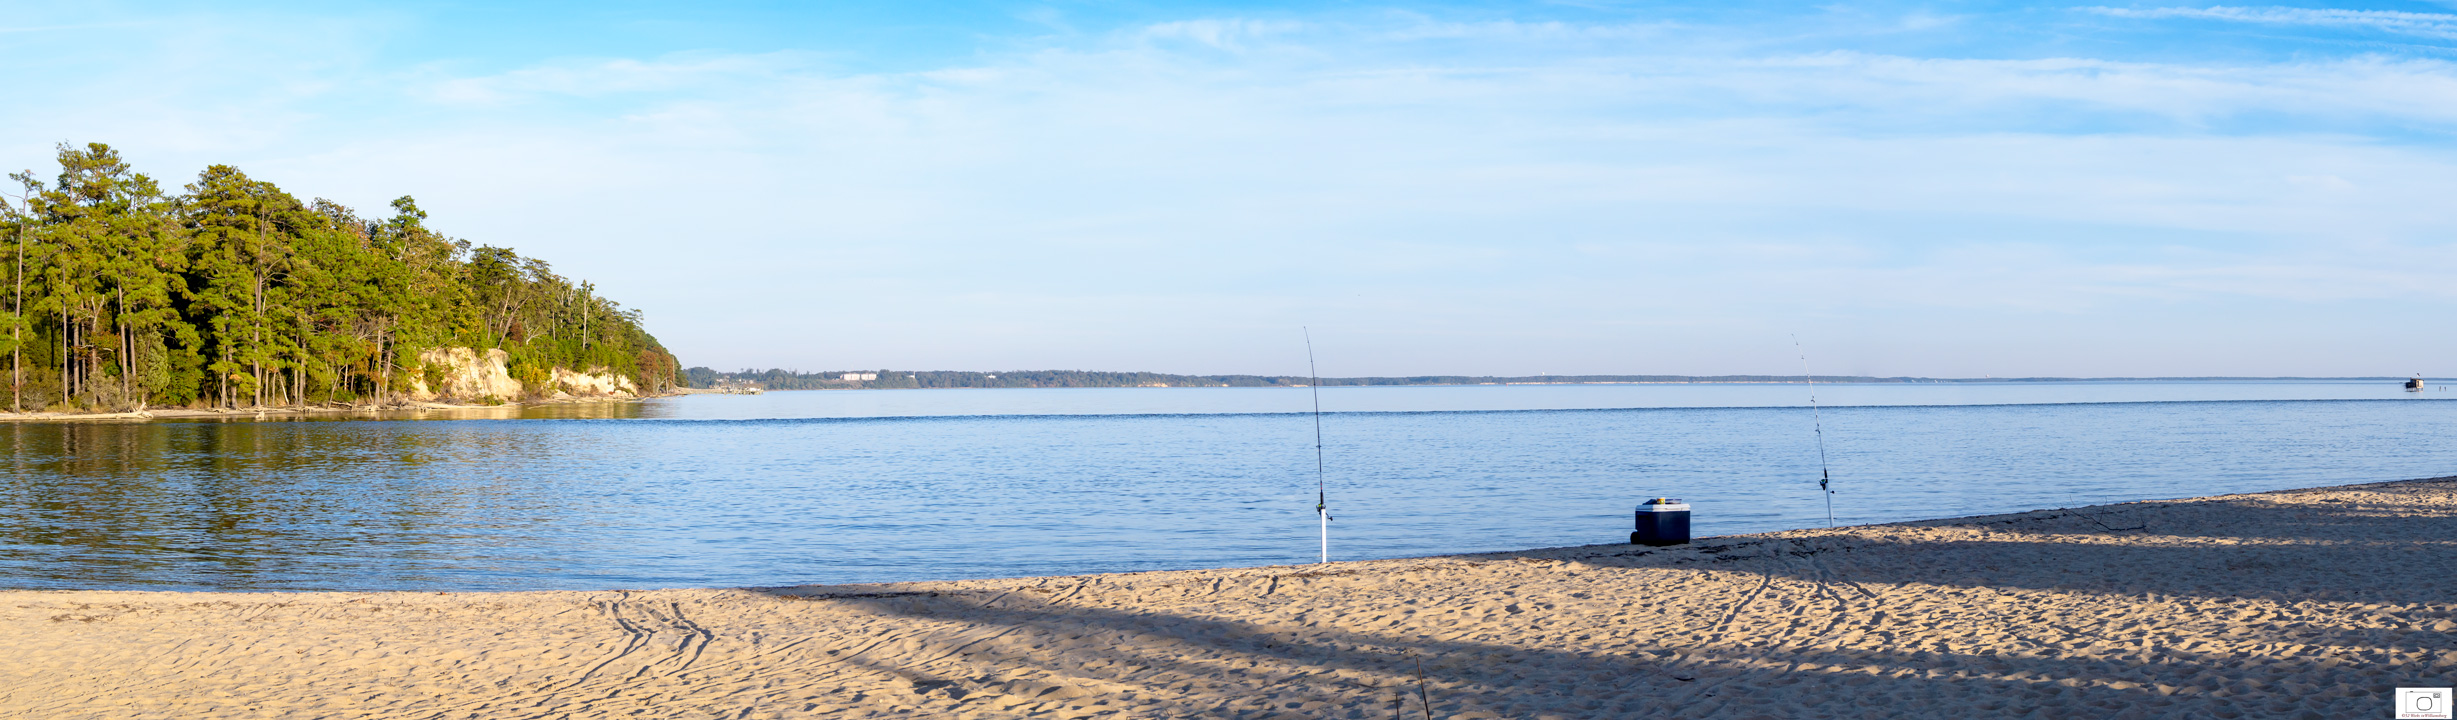 Fall Afternoon at College Creek Beach Looking at the Sandbar - October 2015